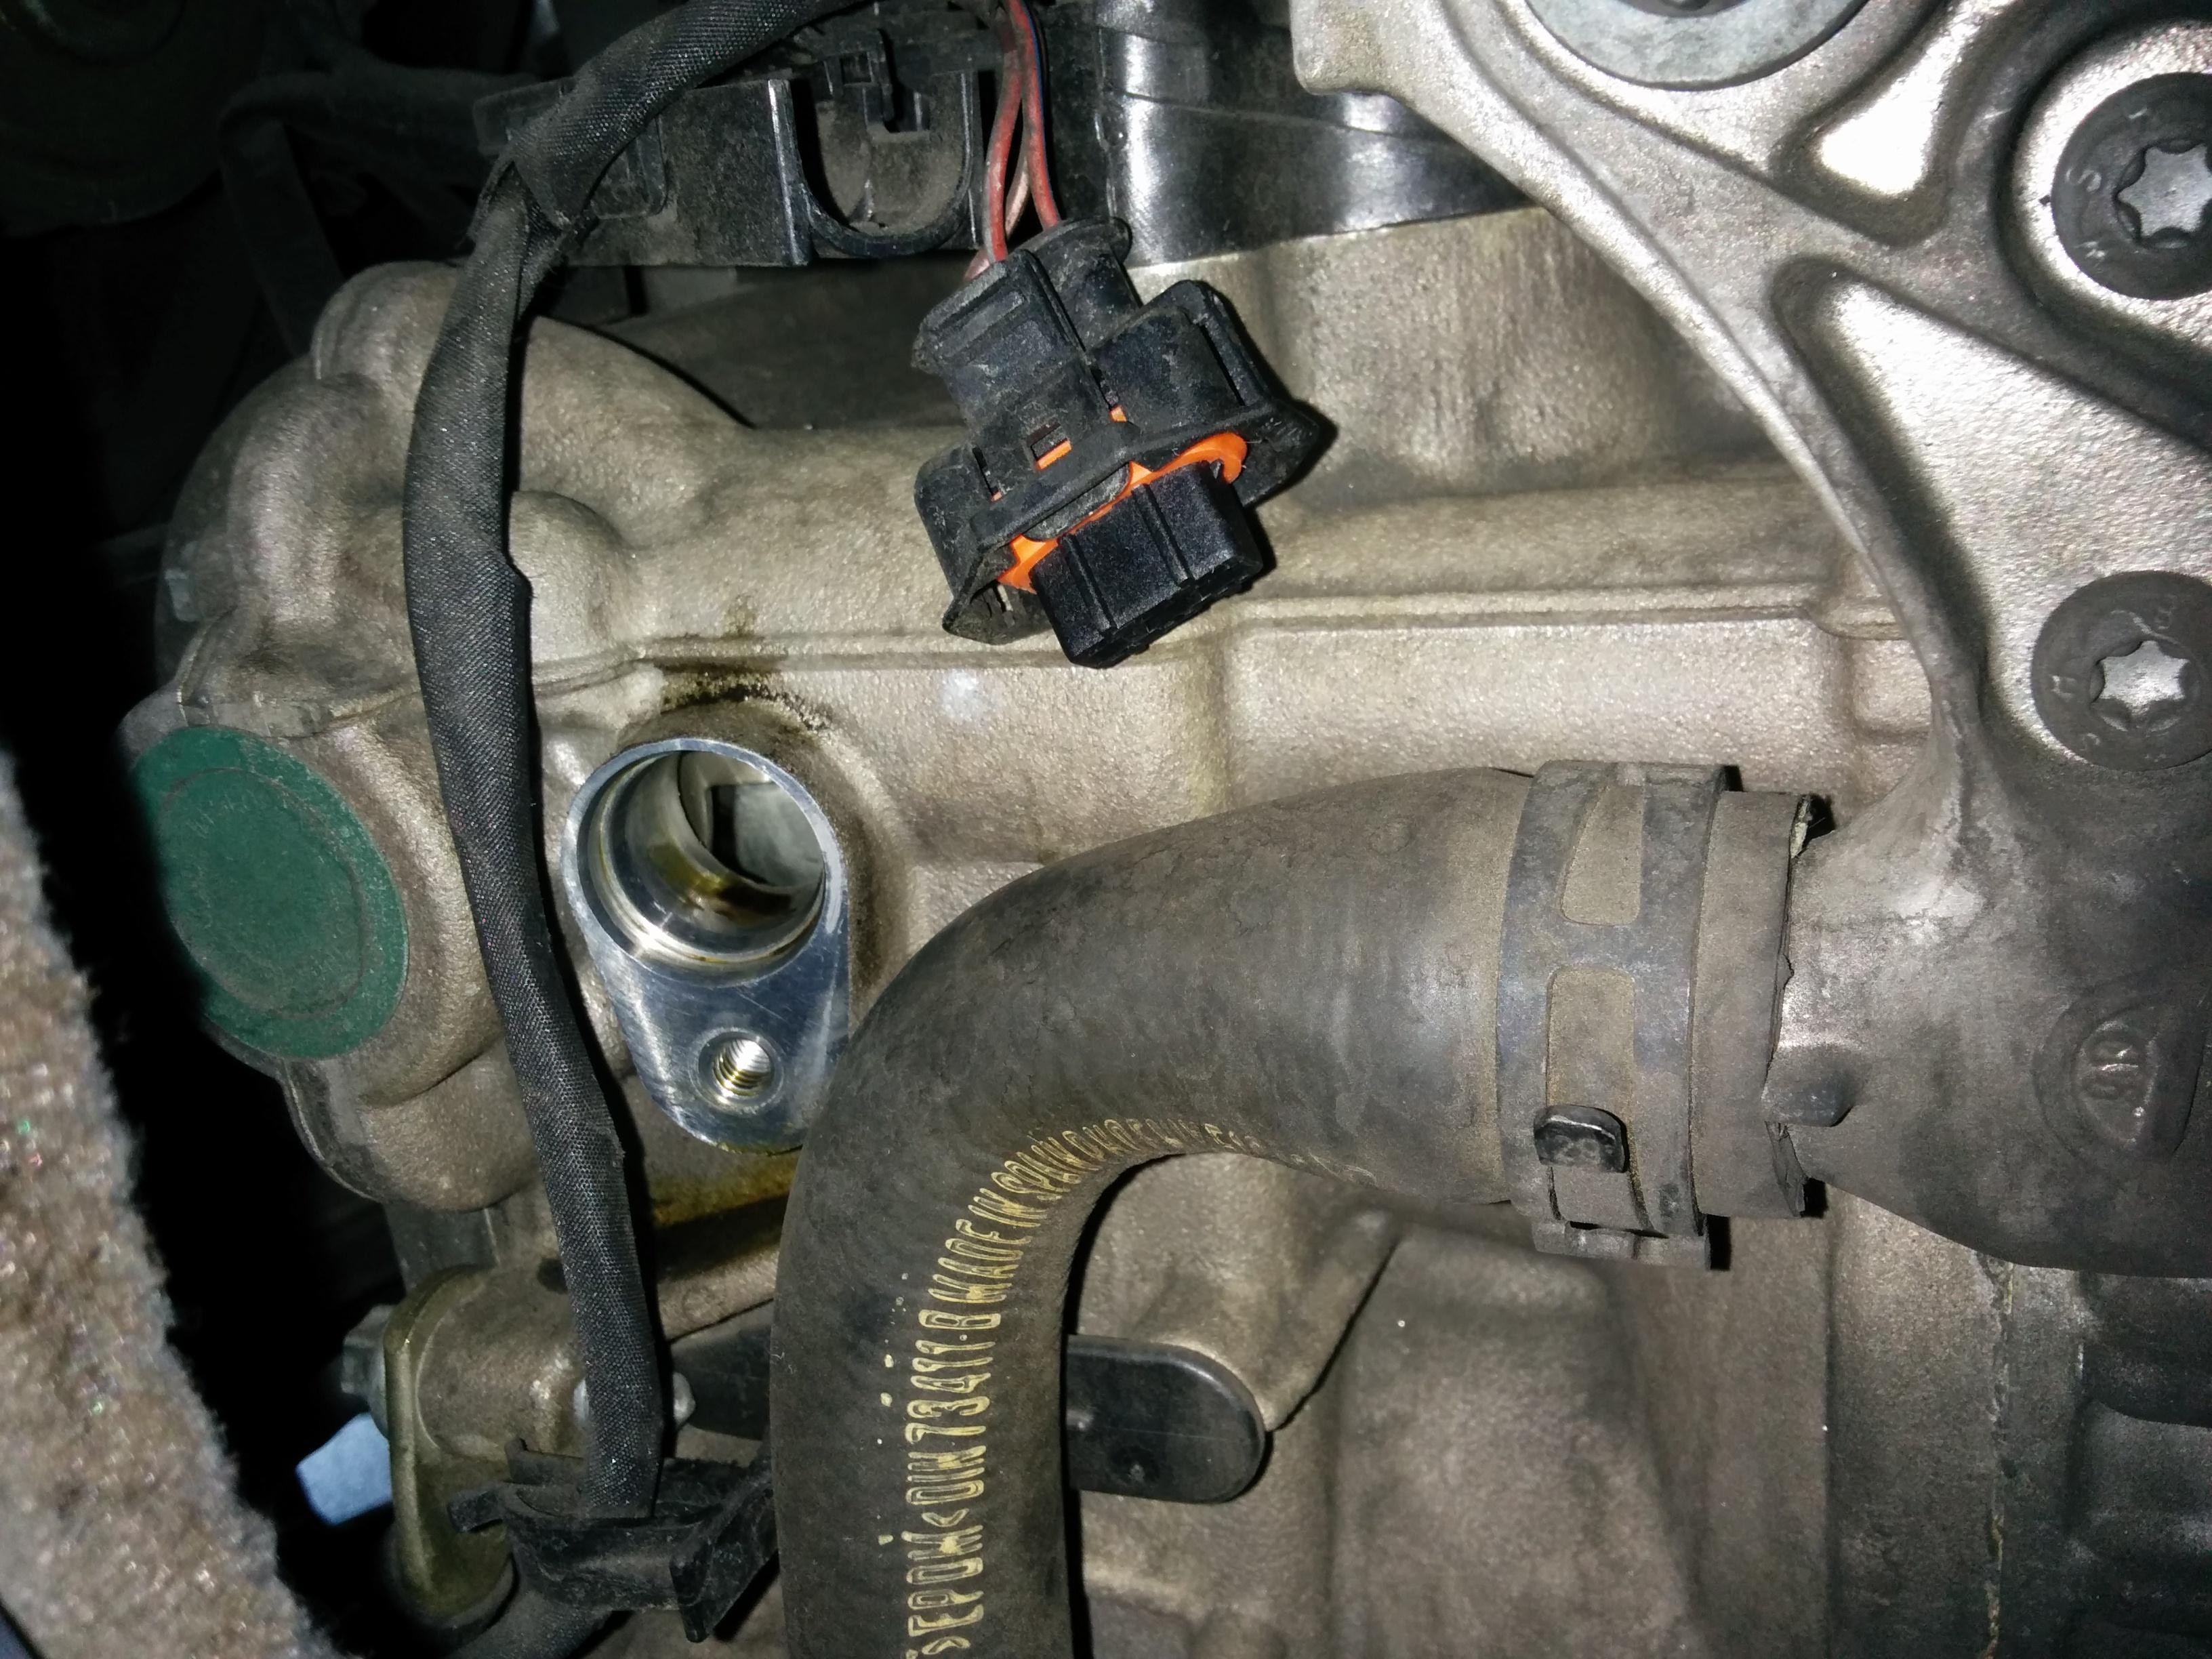 odd oil leak near sensor noticed replacing drive belt img_20141101_170840 jpg